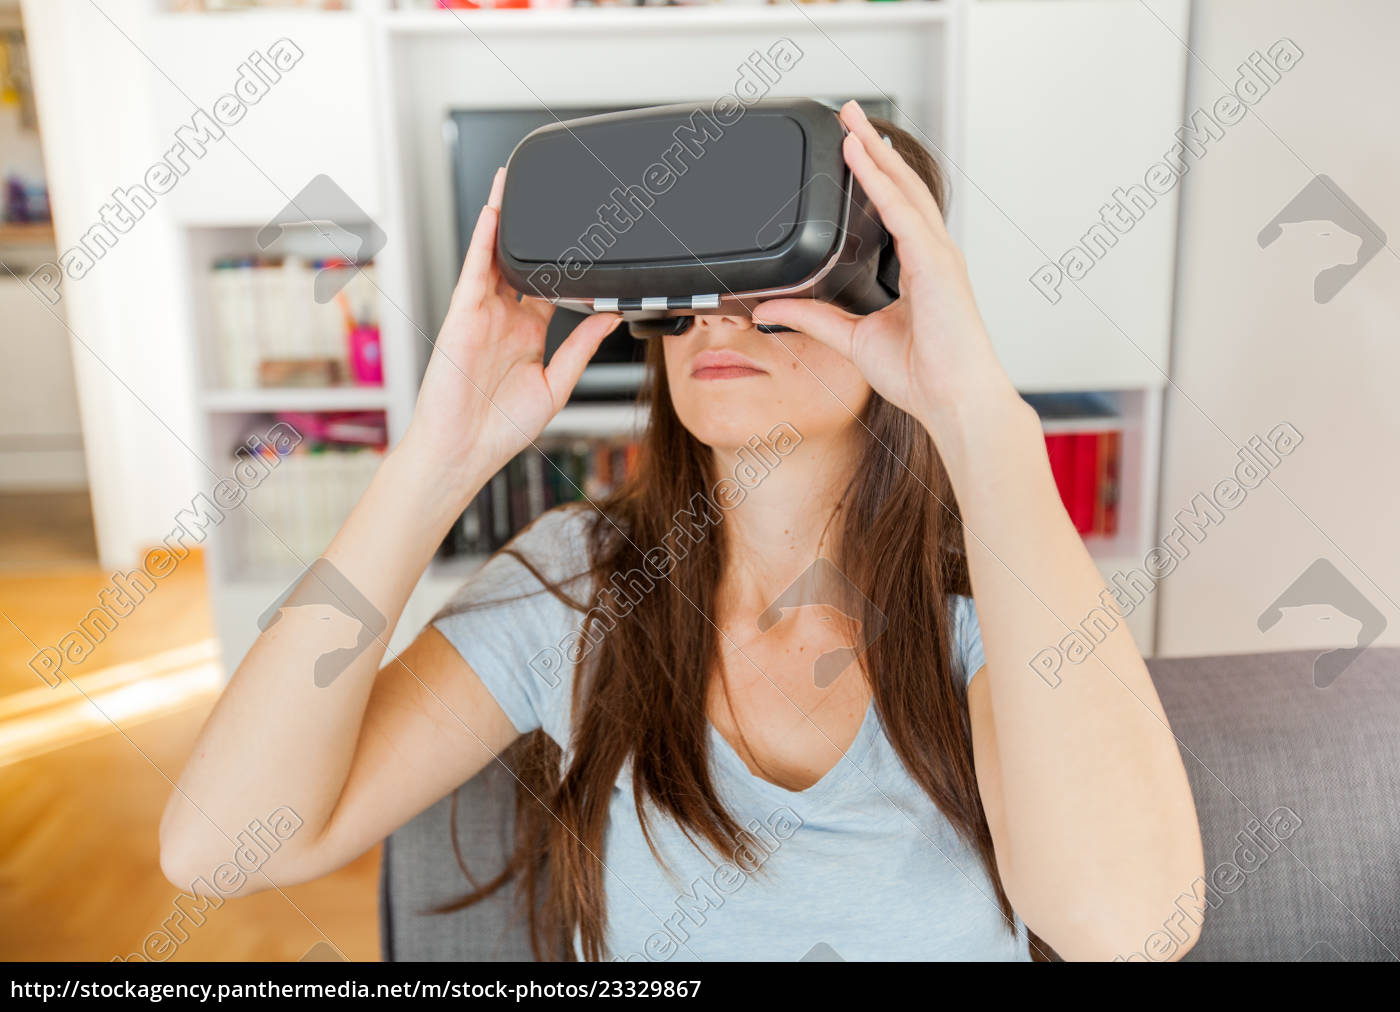 virtual, reality, device, woman, home - 23329867